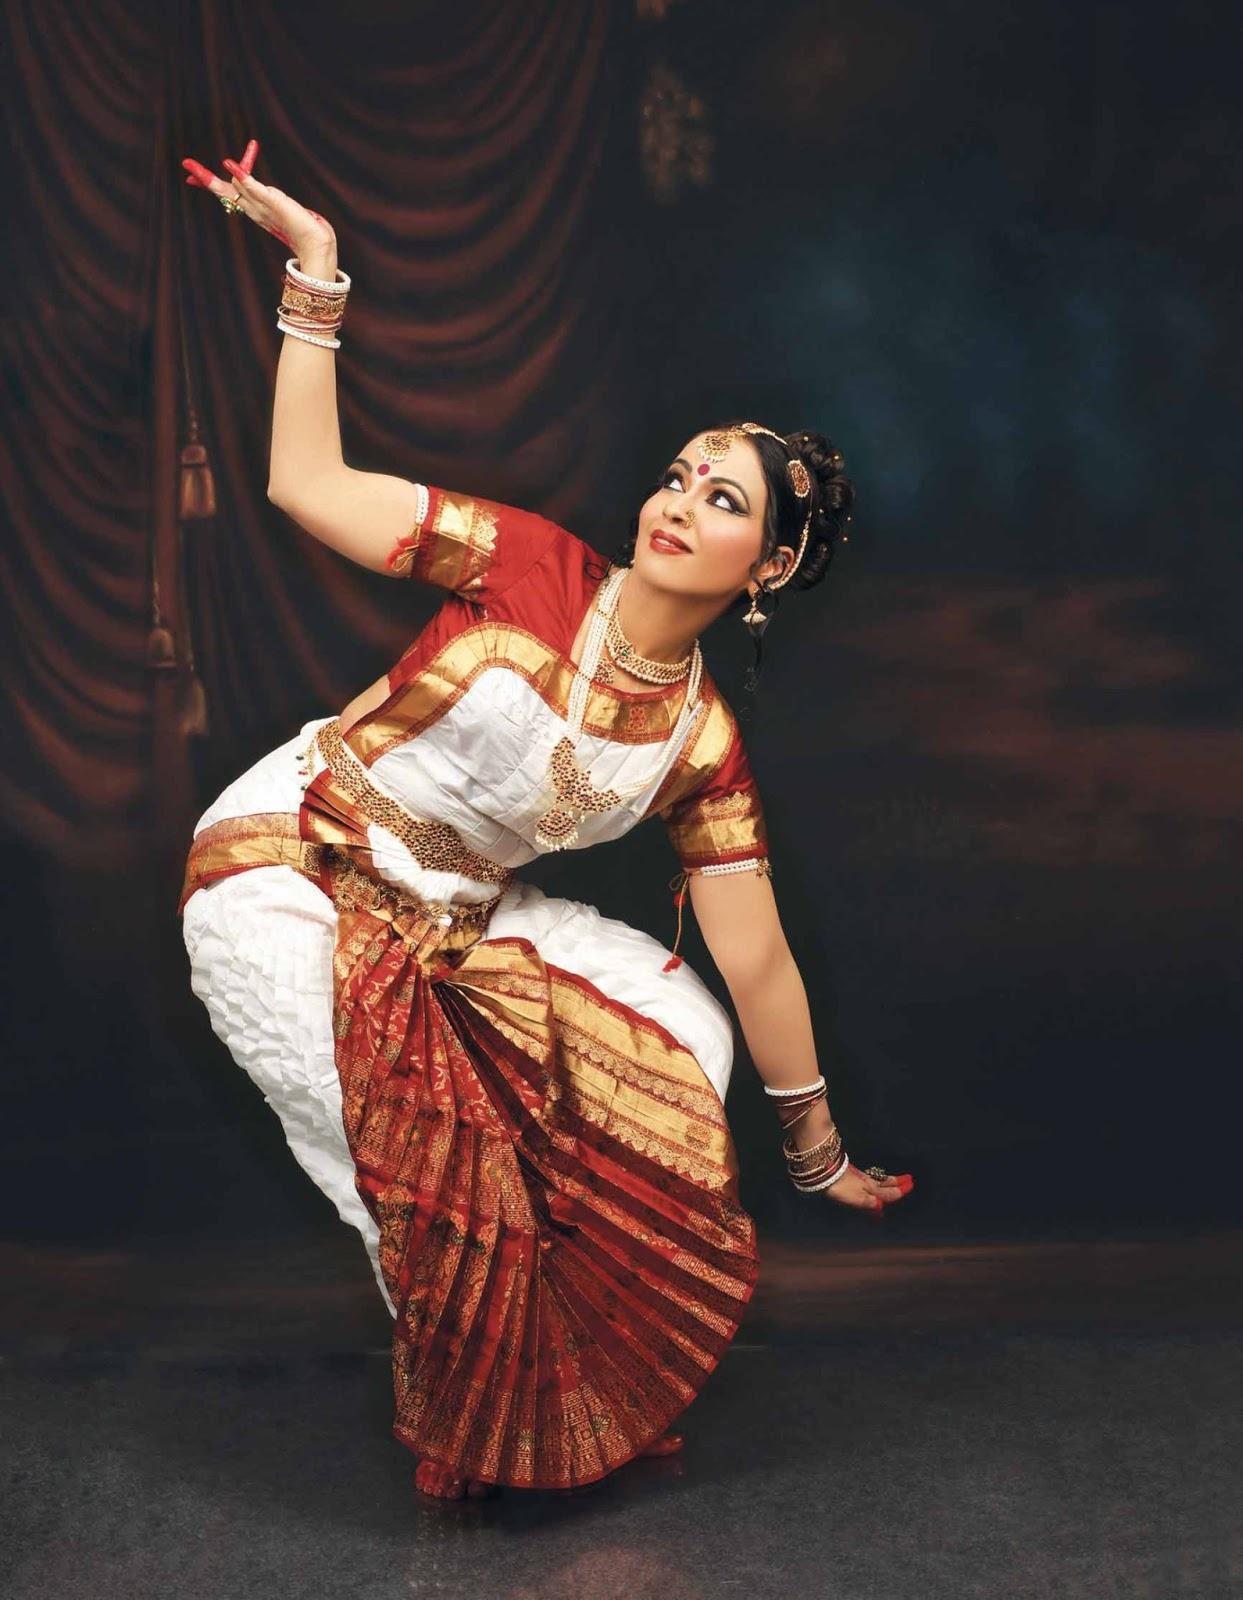 bharatanatyam poses - photo #7